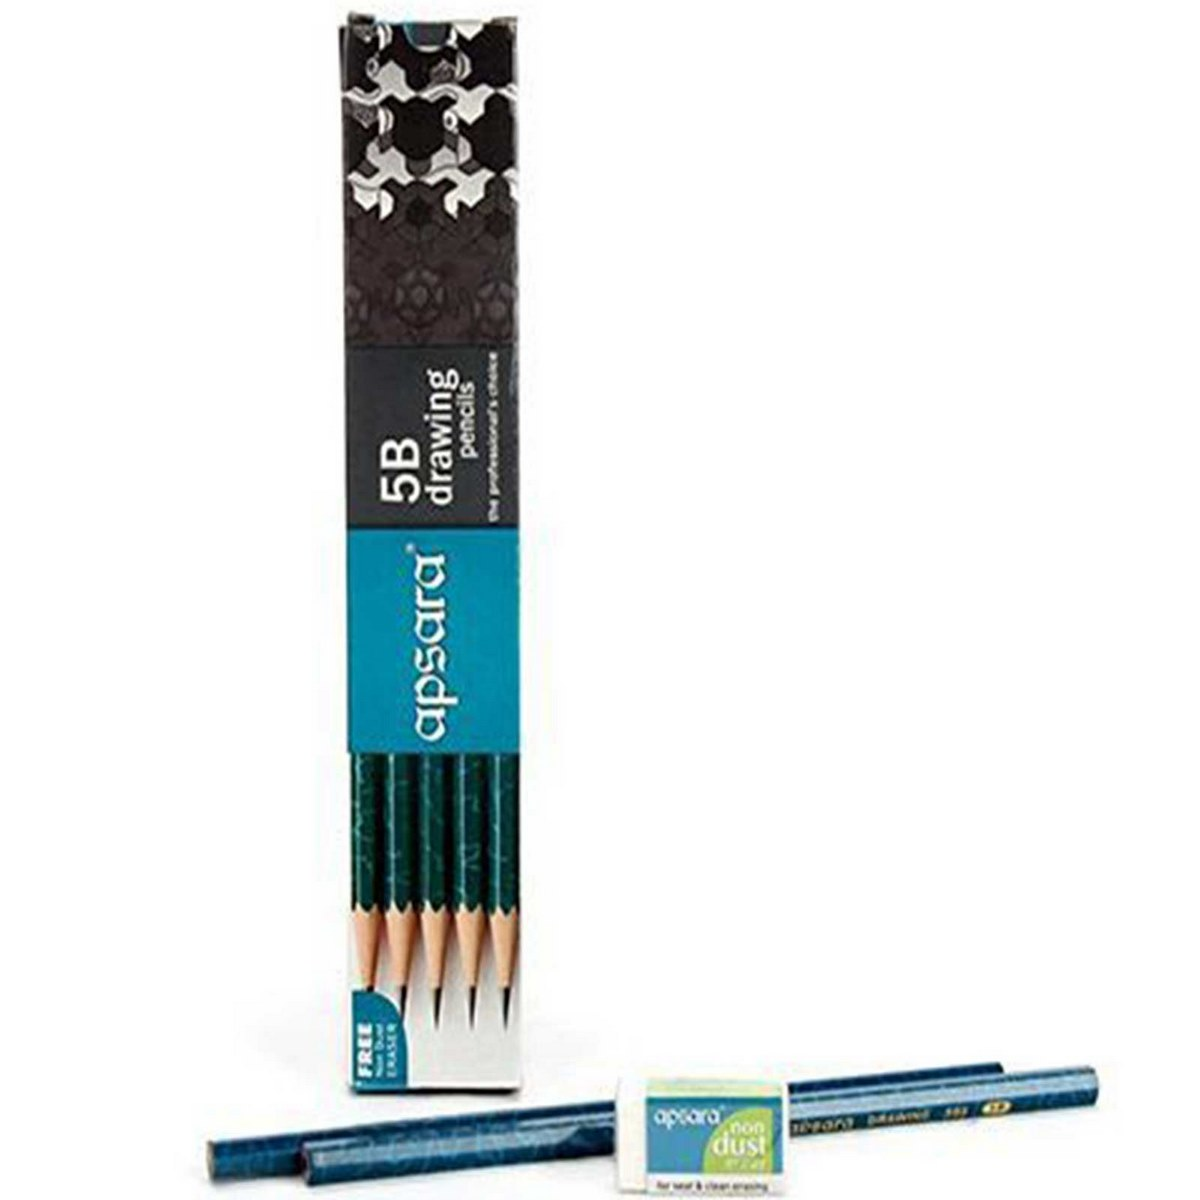 Apsara Drawing Pencils (Lead Size: 5B) Black 101212002